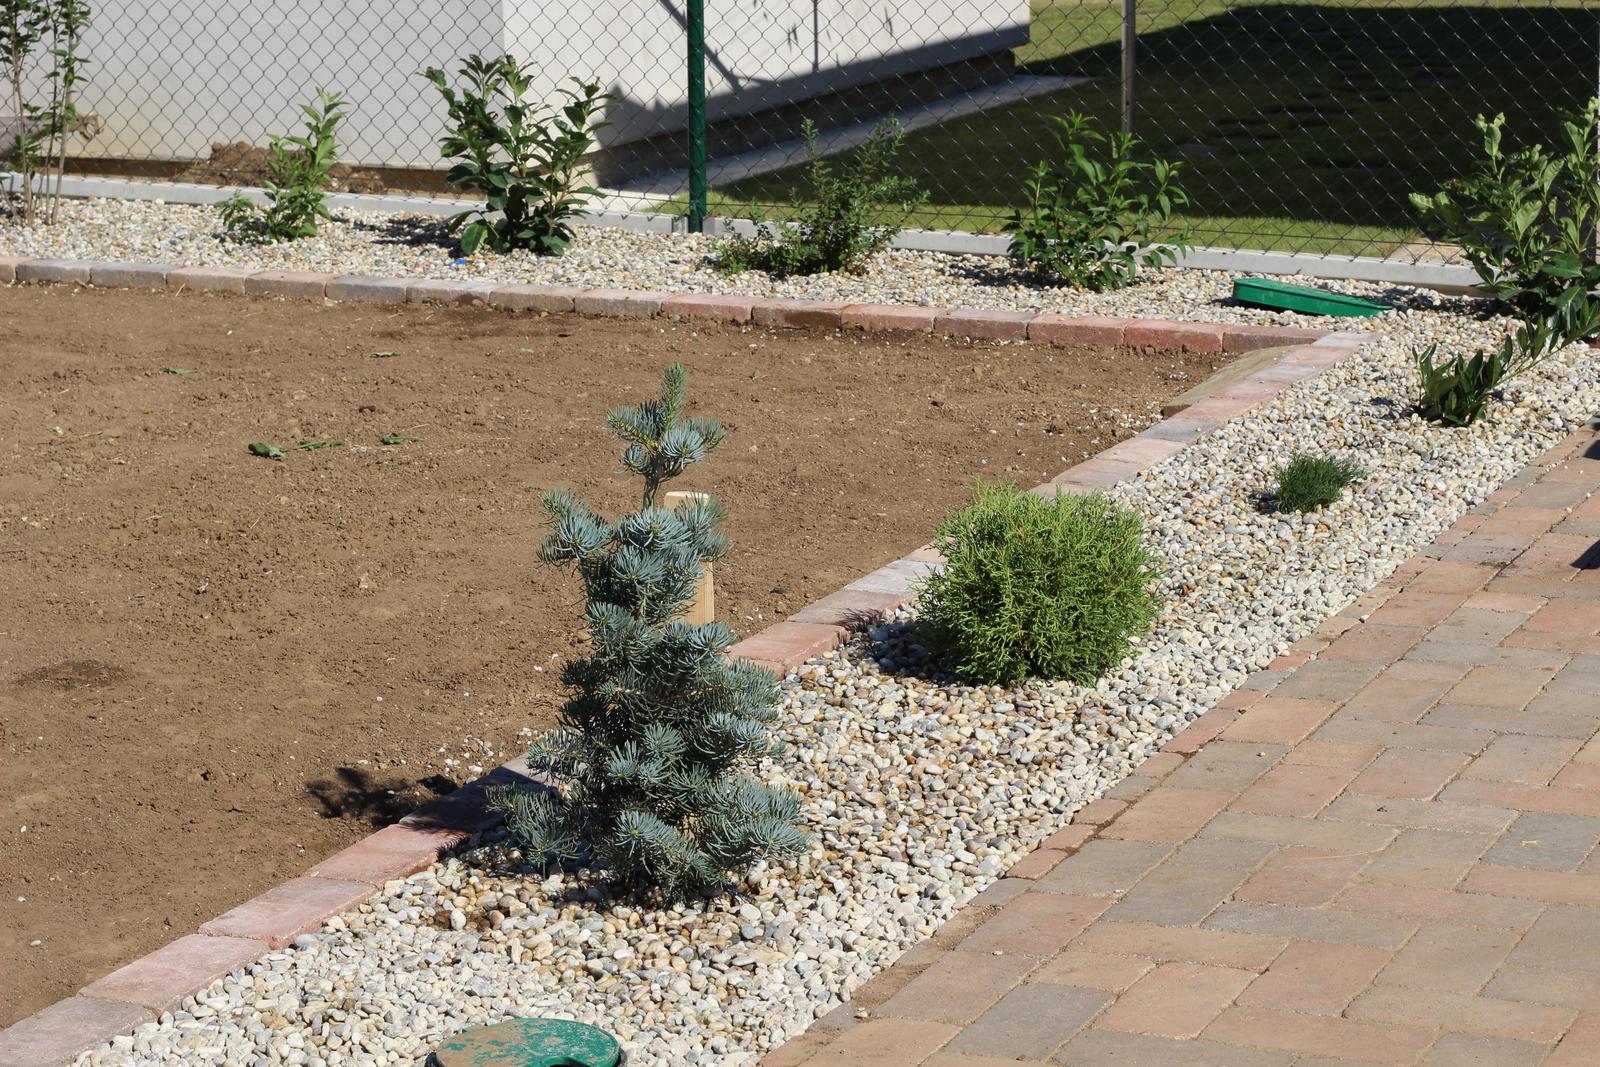 Exteriér - záhrada - Obrázok č. 24